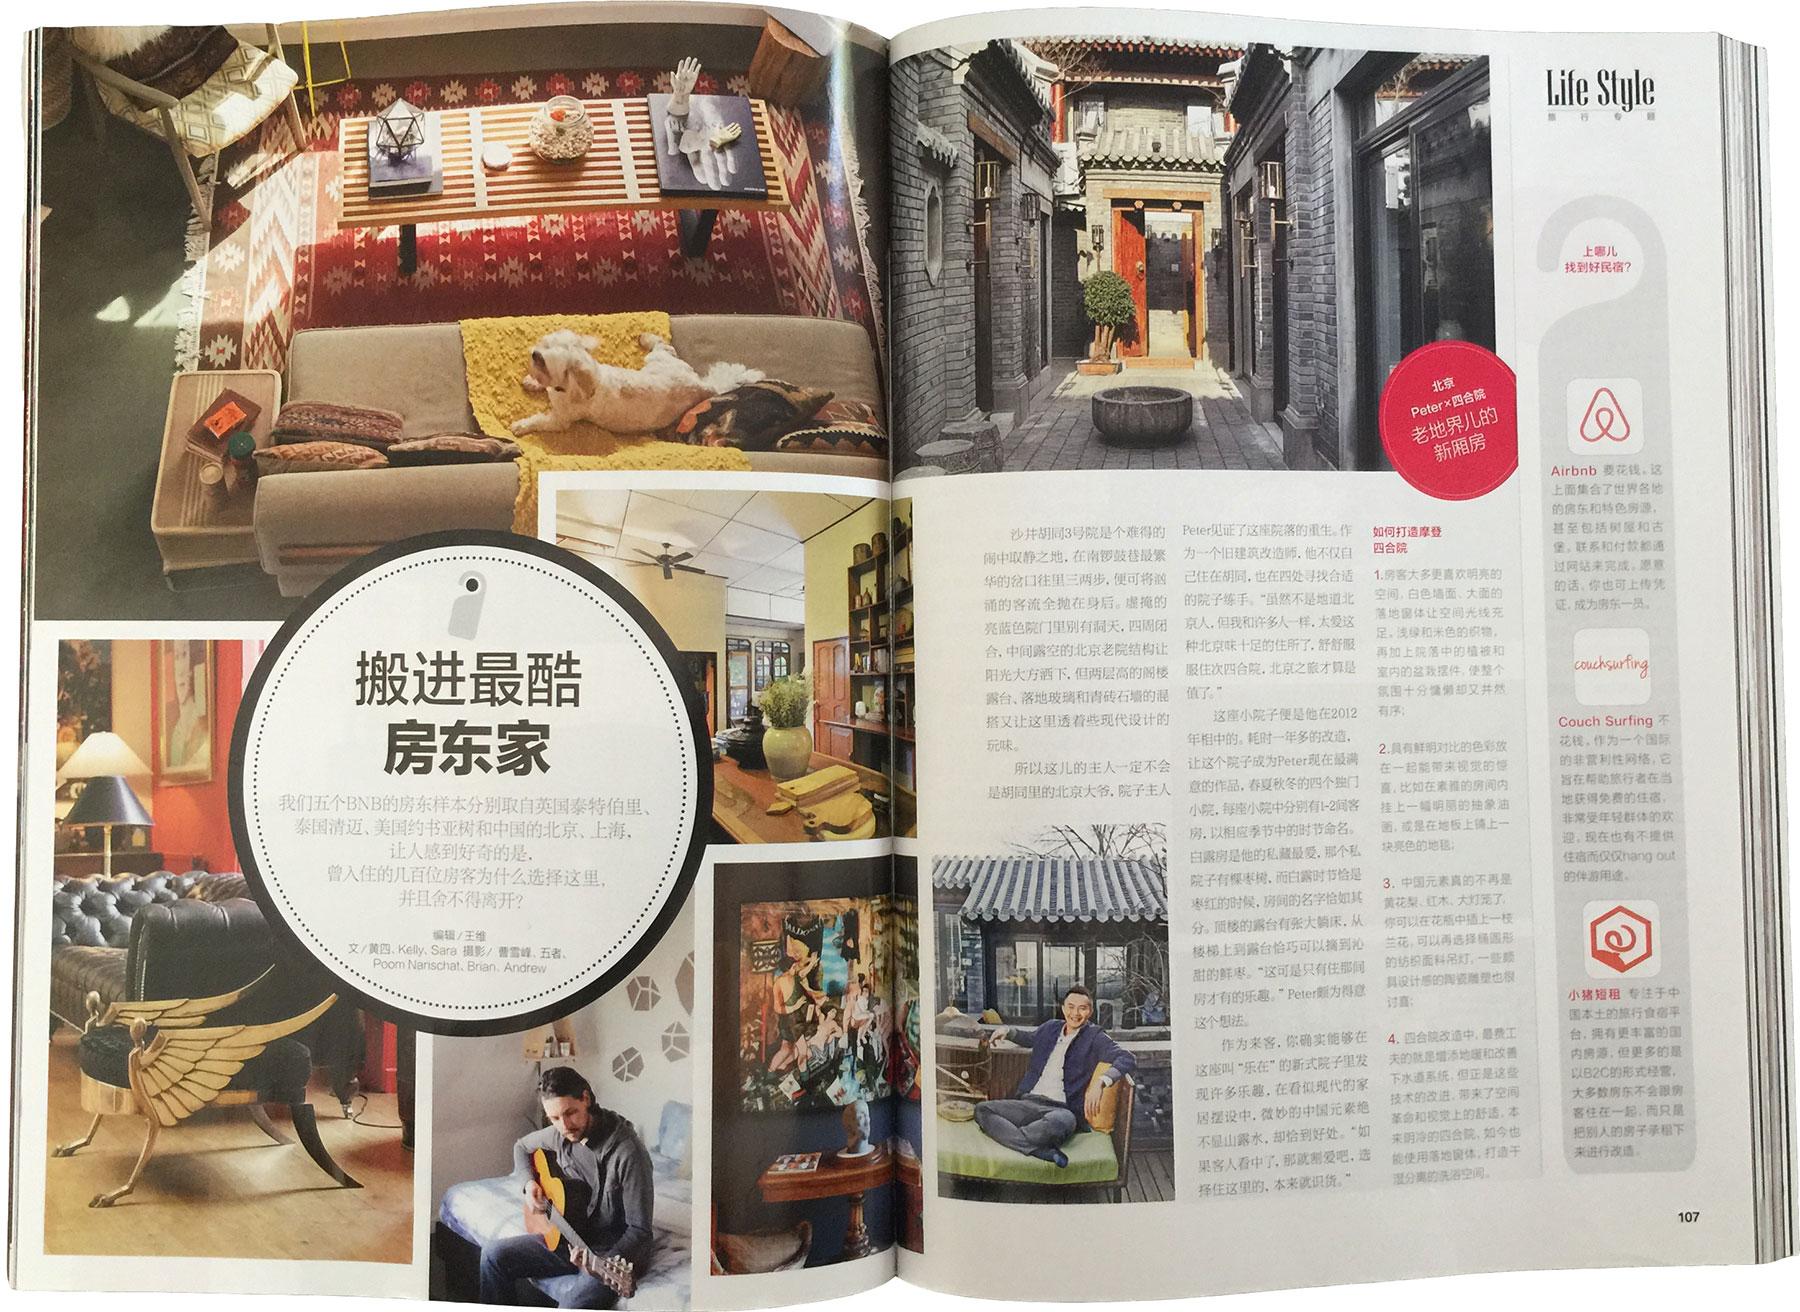 Esquire Magazine China ▲ www.WeAreInOurElement.com